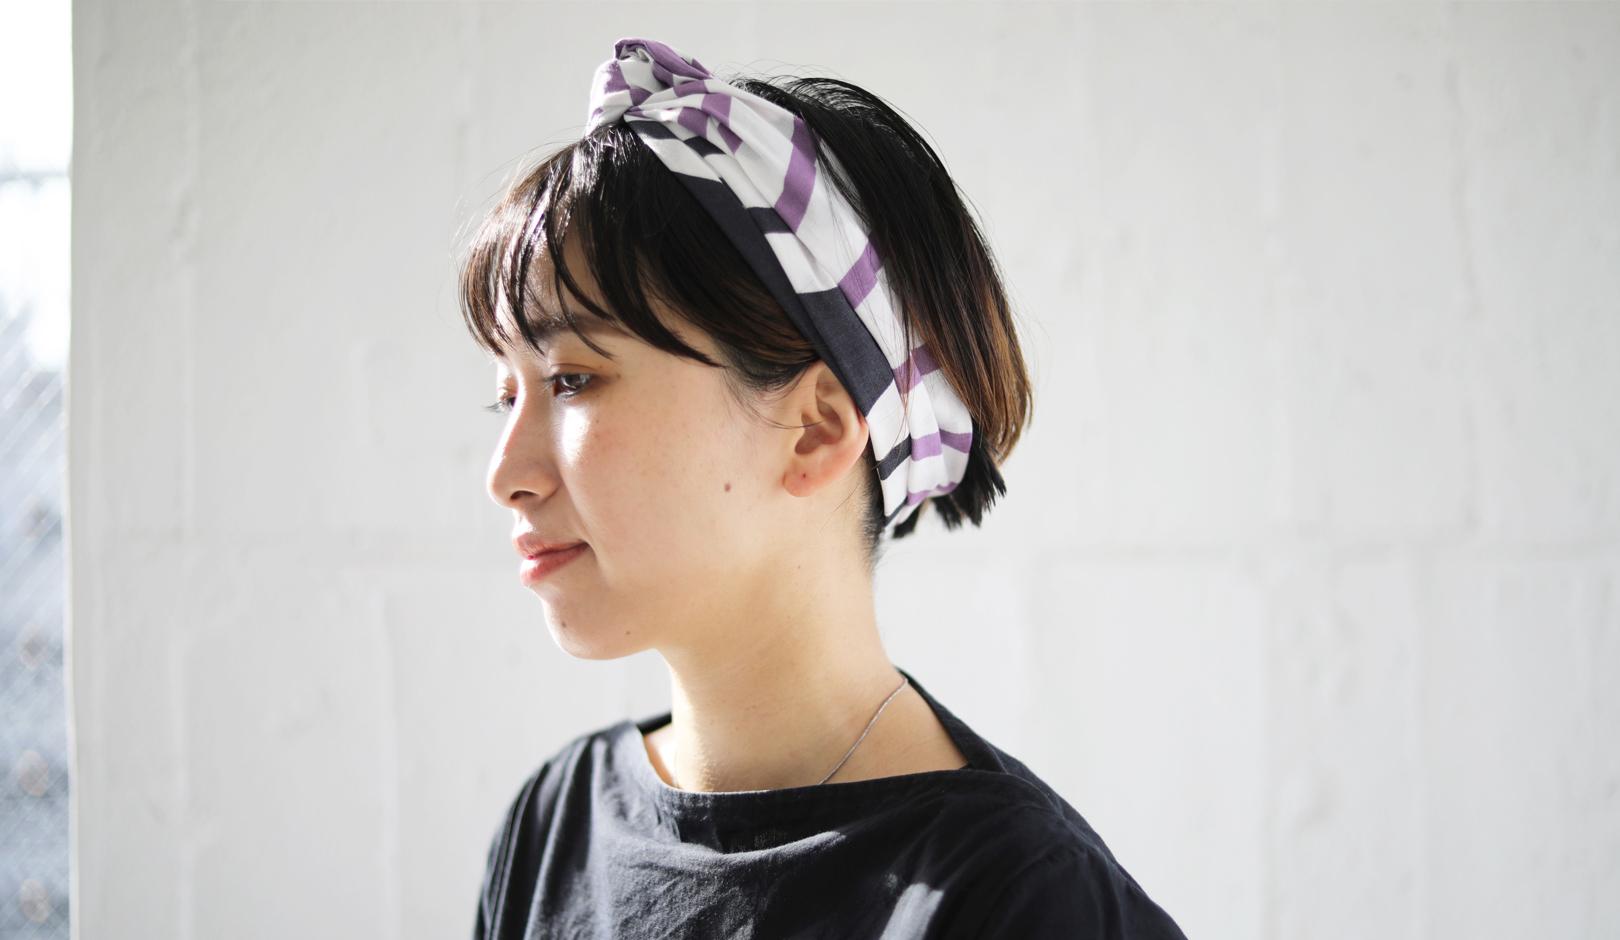 千代美草 - chiyomi-kusa